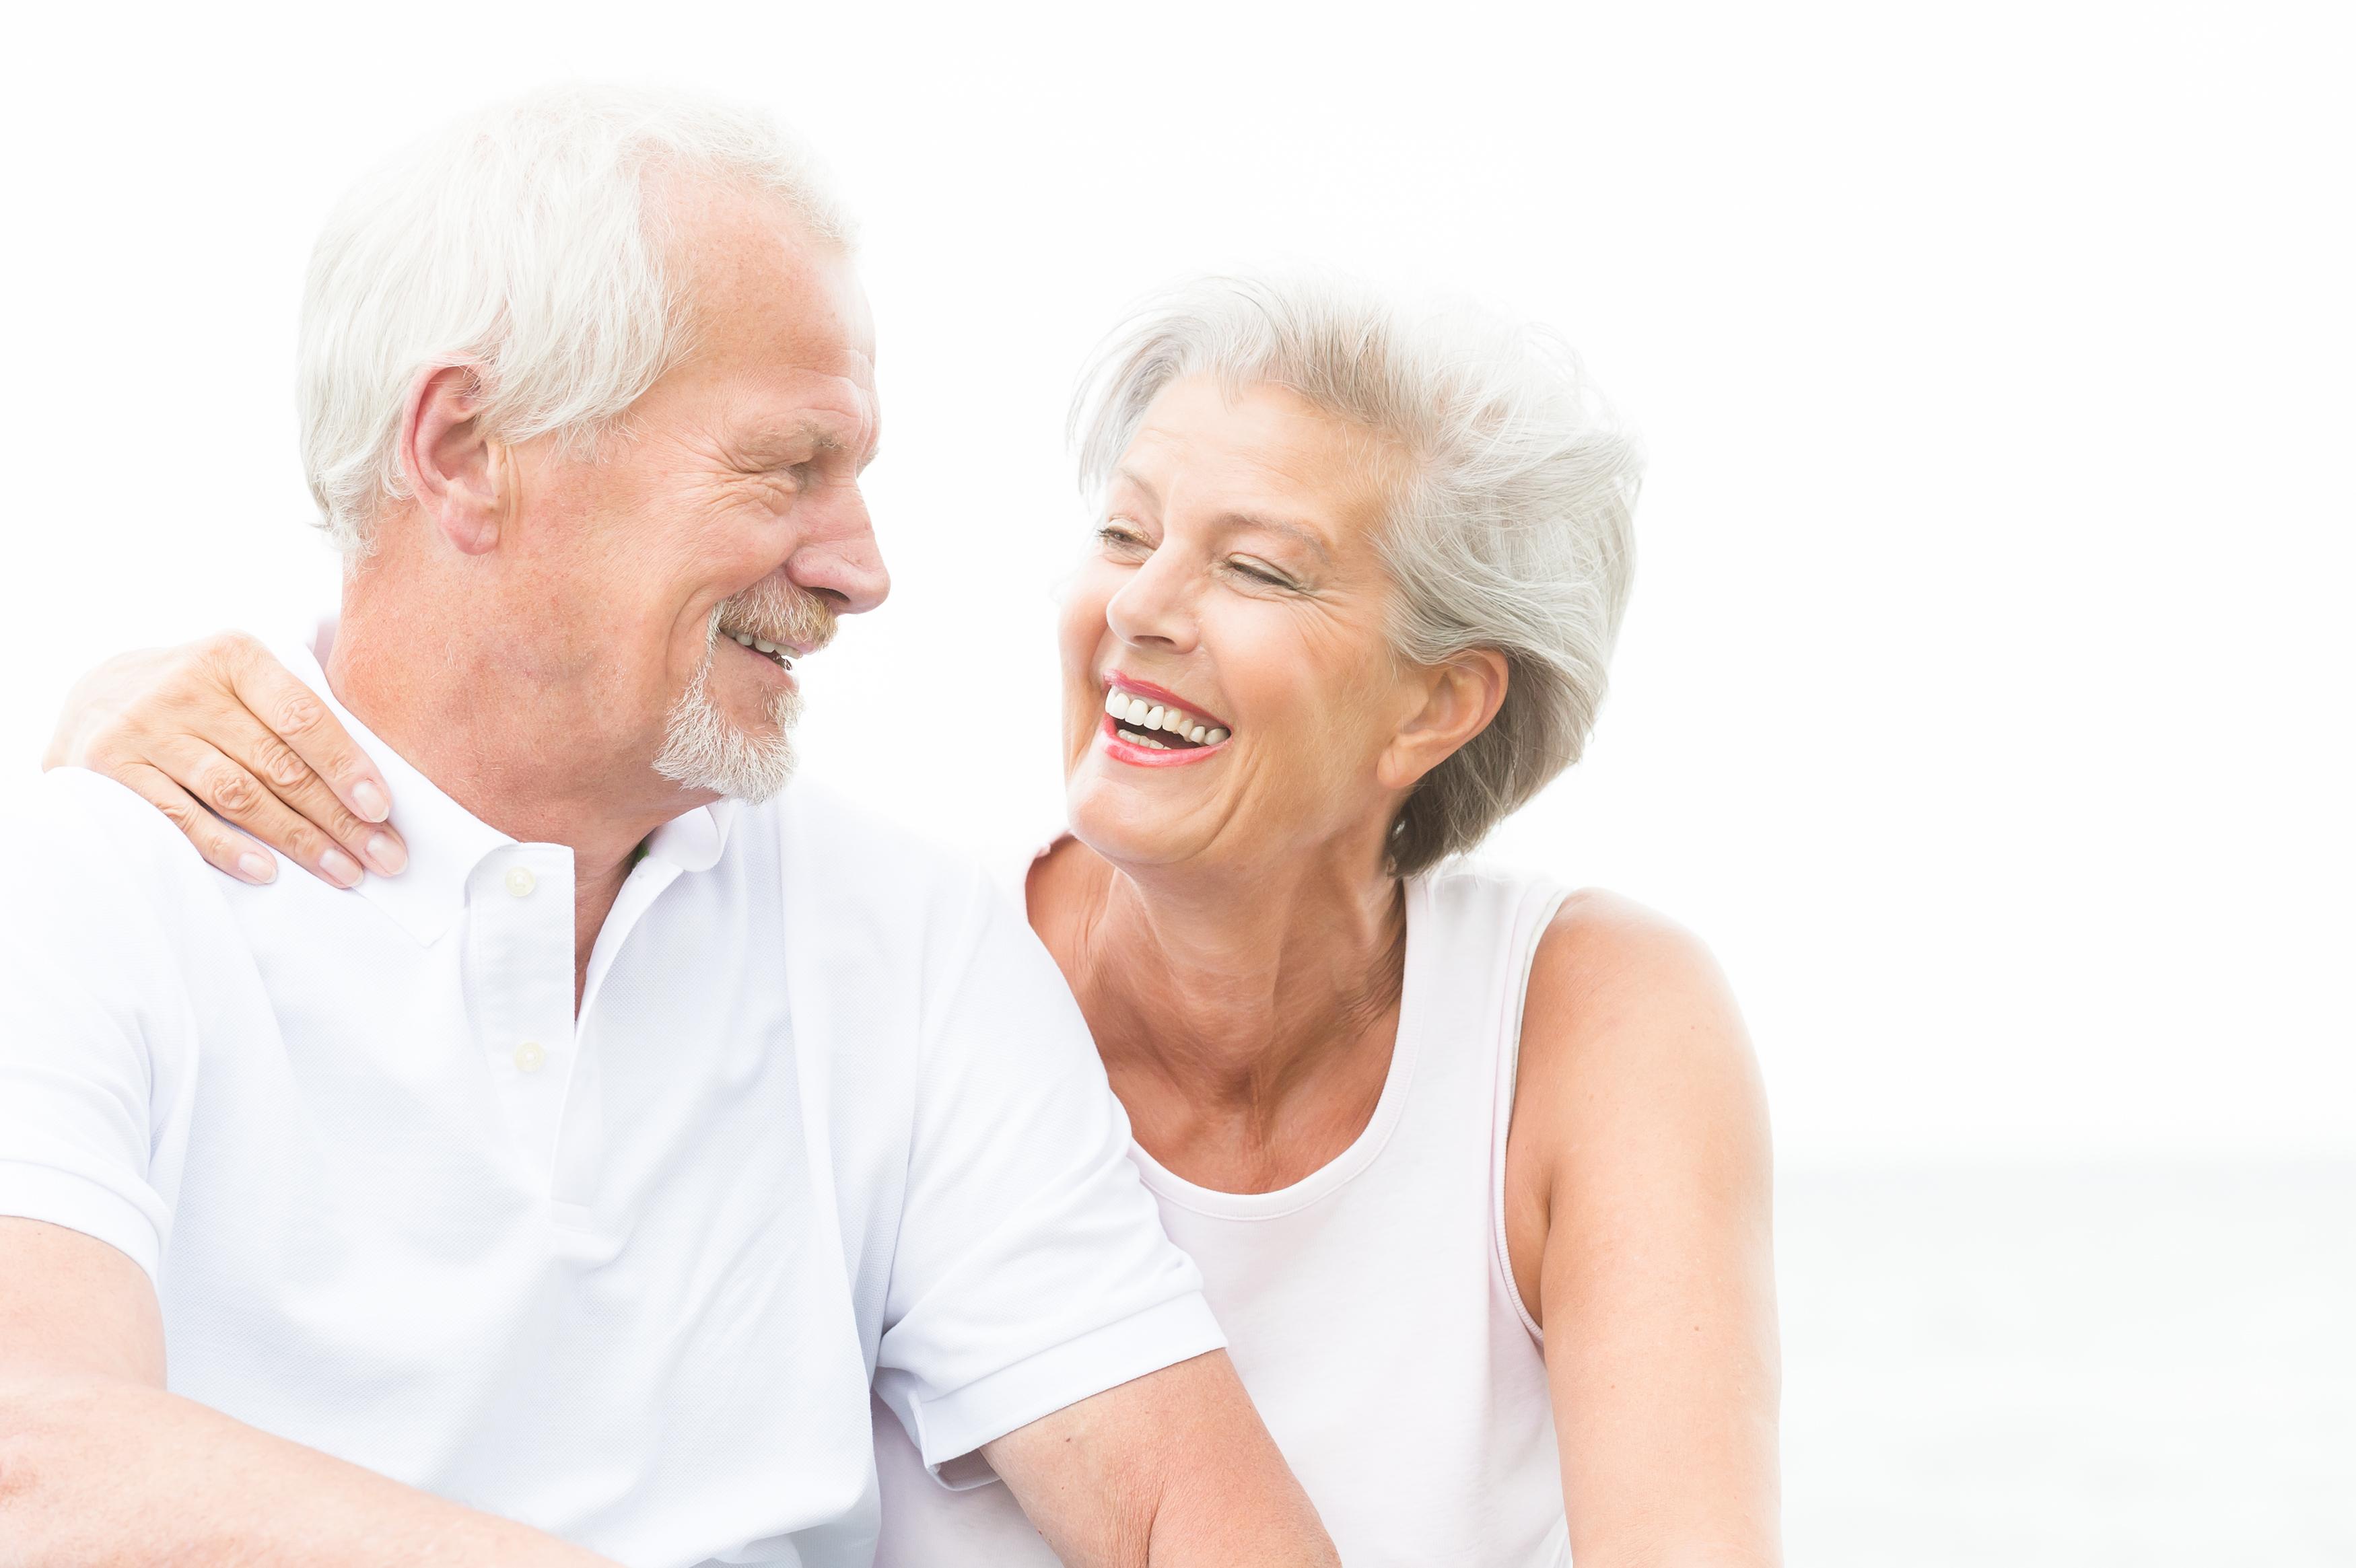 Happy senior couple | A Wiser Mind